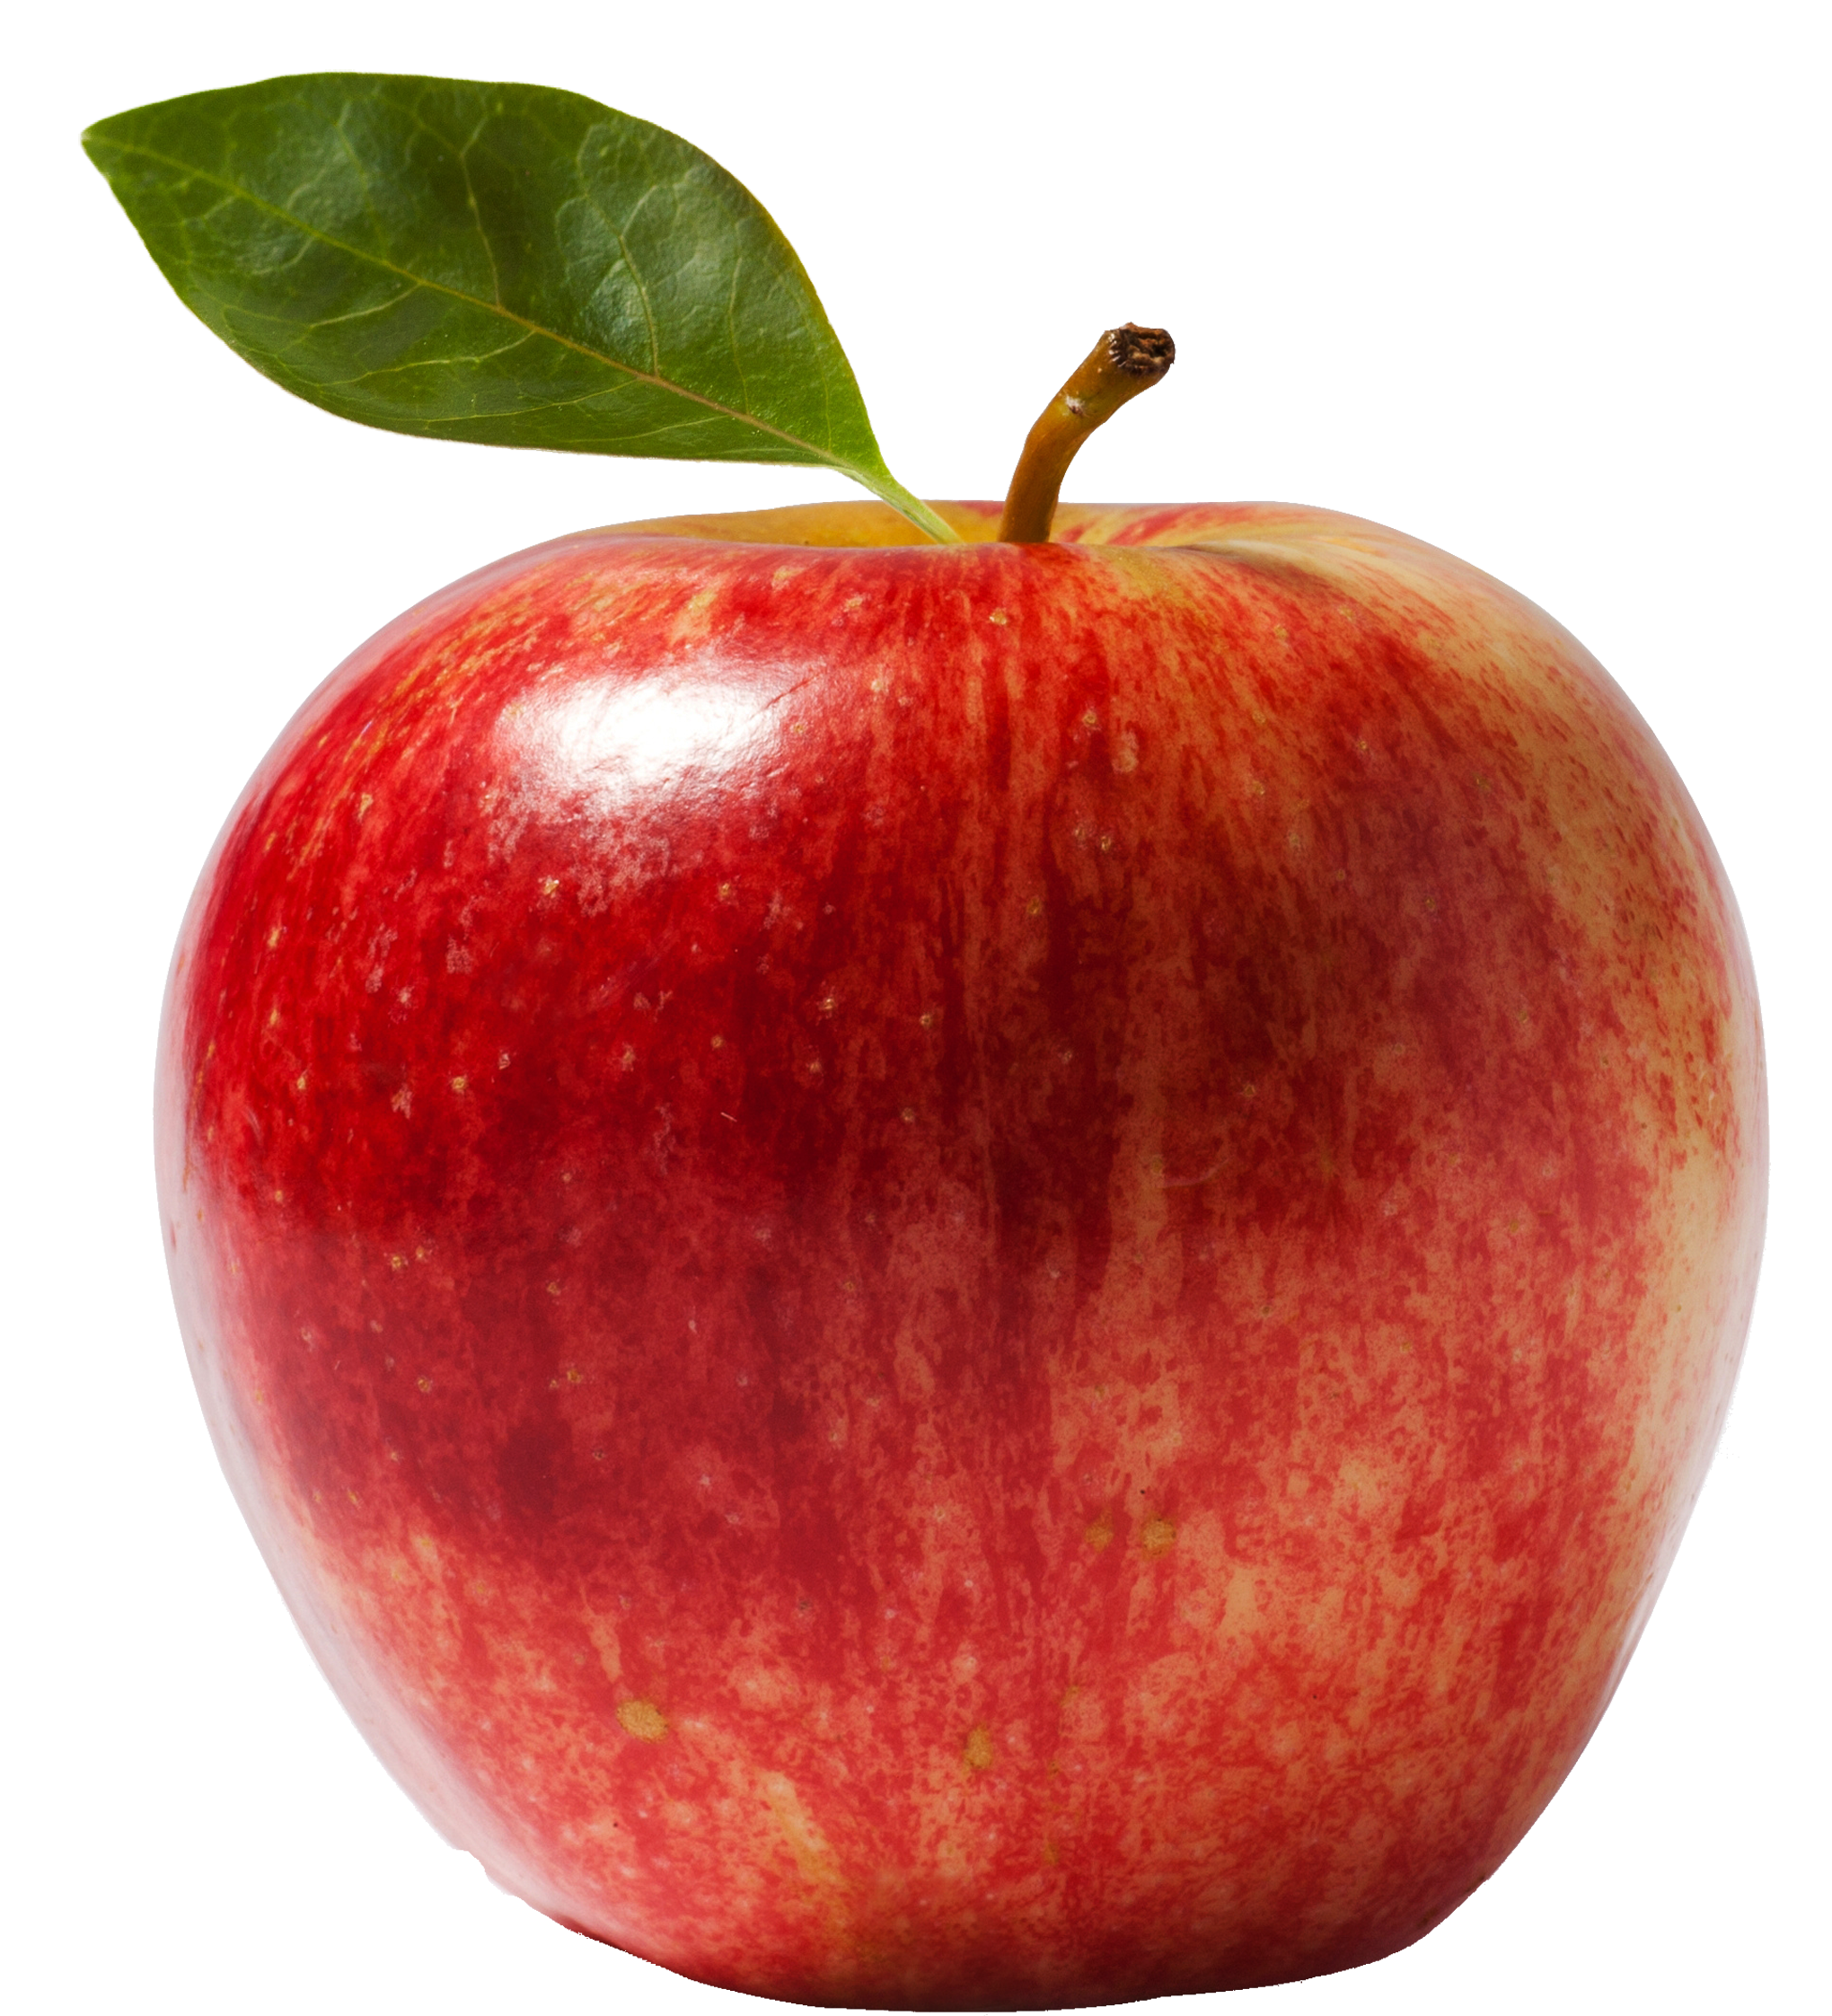 Apple PNG Image - Apple Fruit PNG